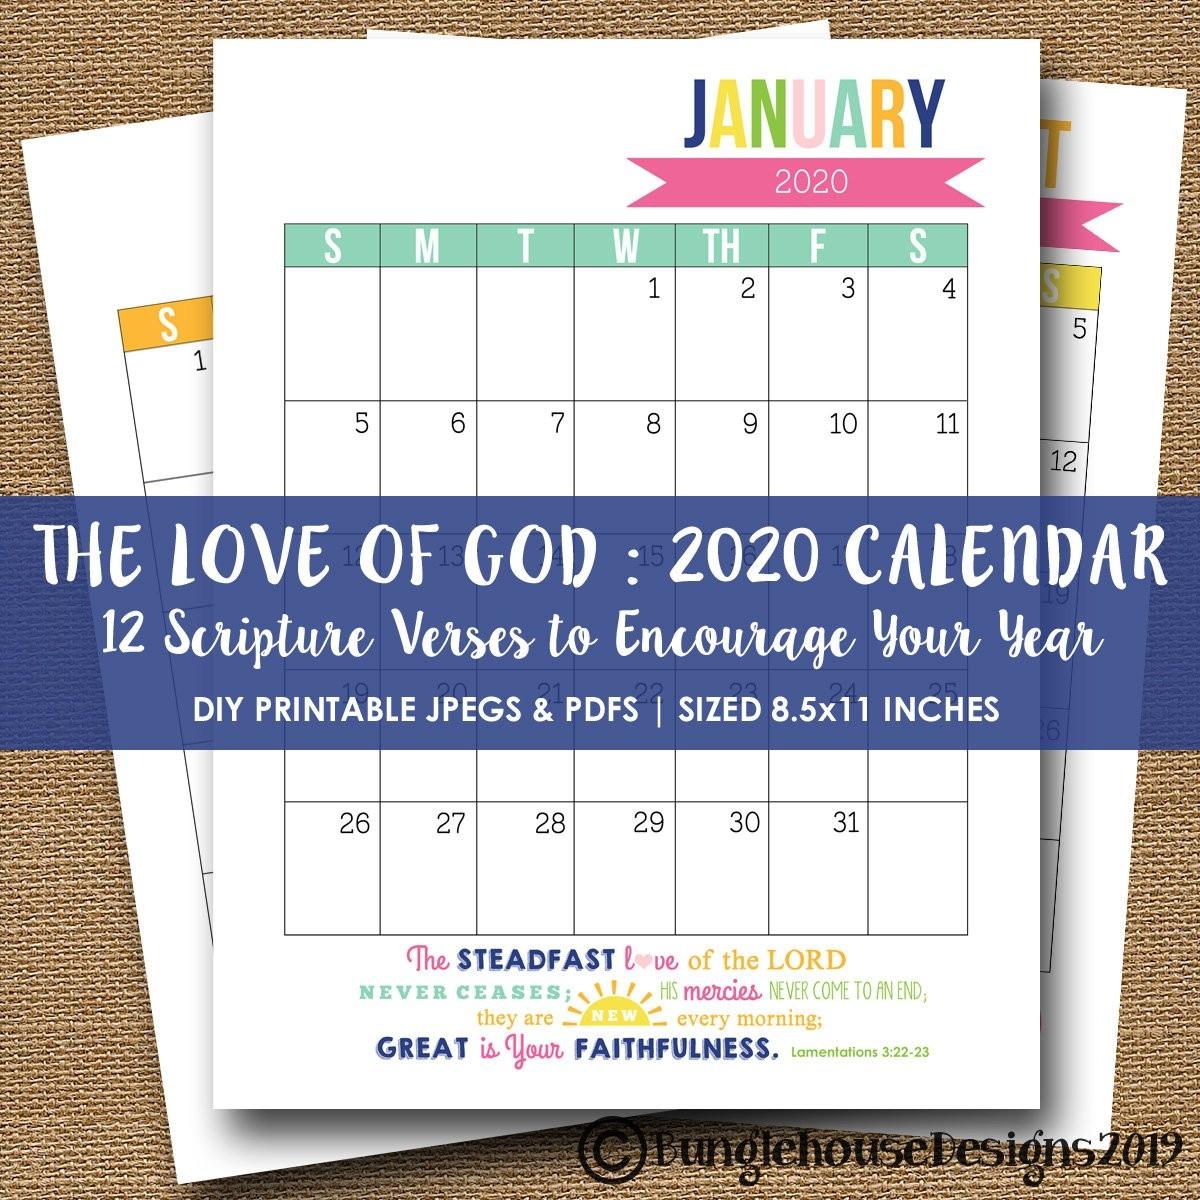 2020 Printable Calendar | 2020 Scripture, Bible Verse Calendar | Instant  Download Printable Calendar For 2020 Planner | Christian Calendar  Printable Calendar 2020 With Scriptures